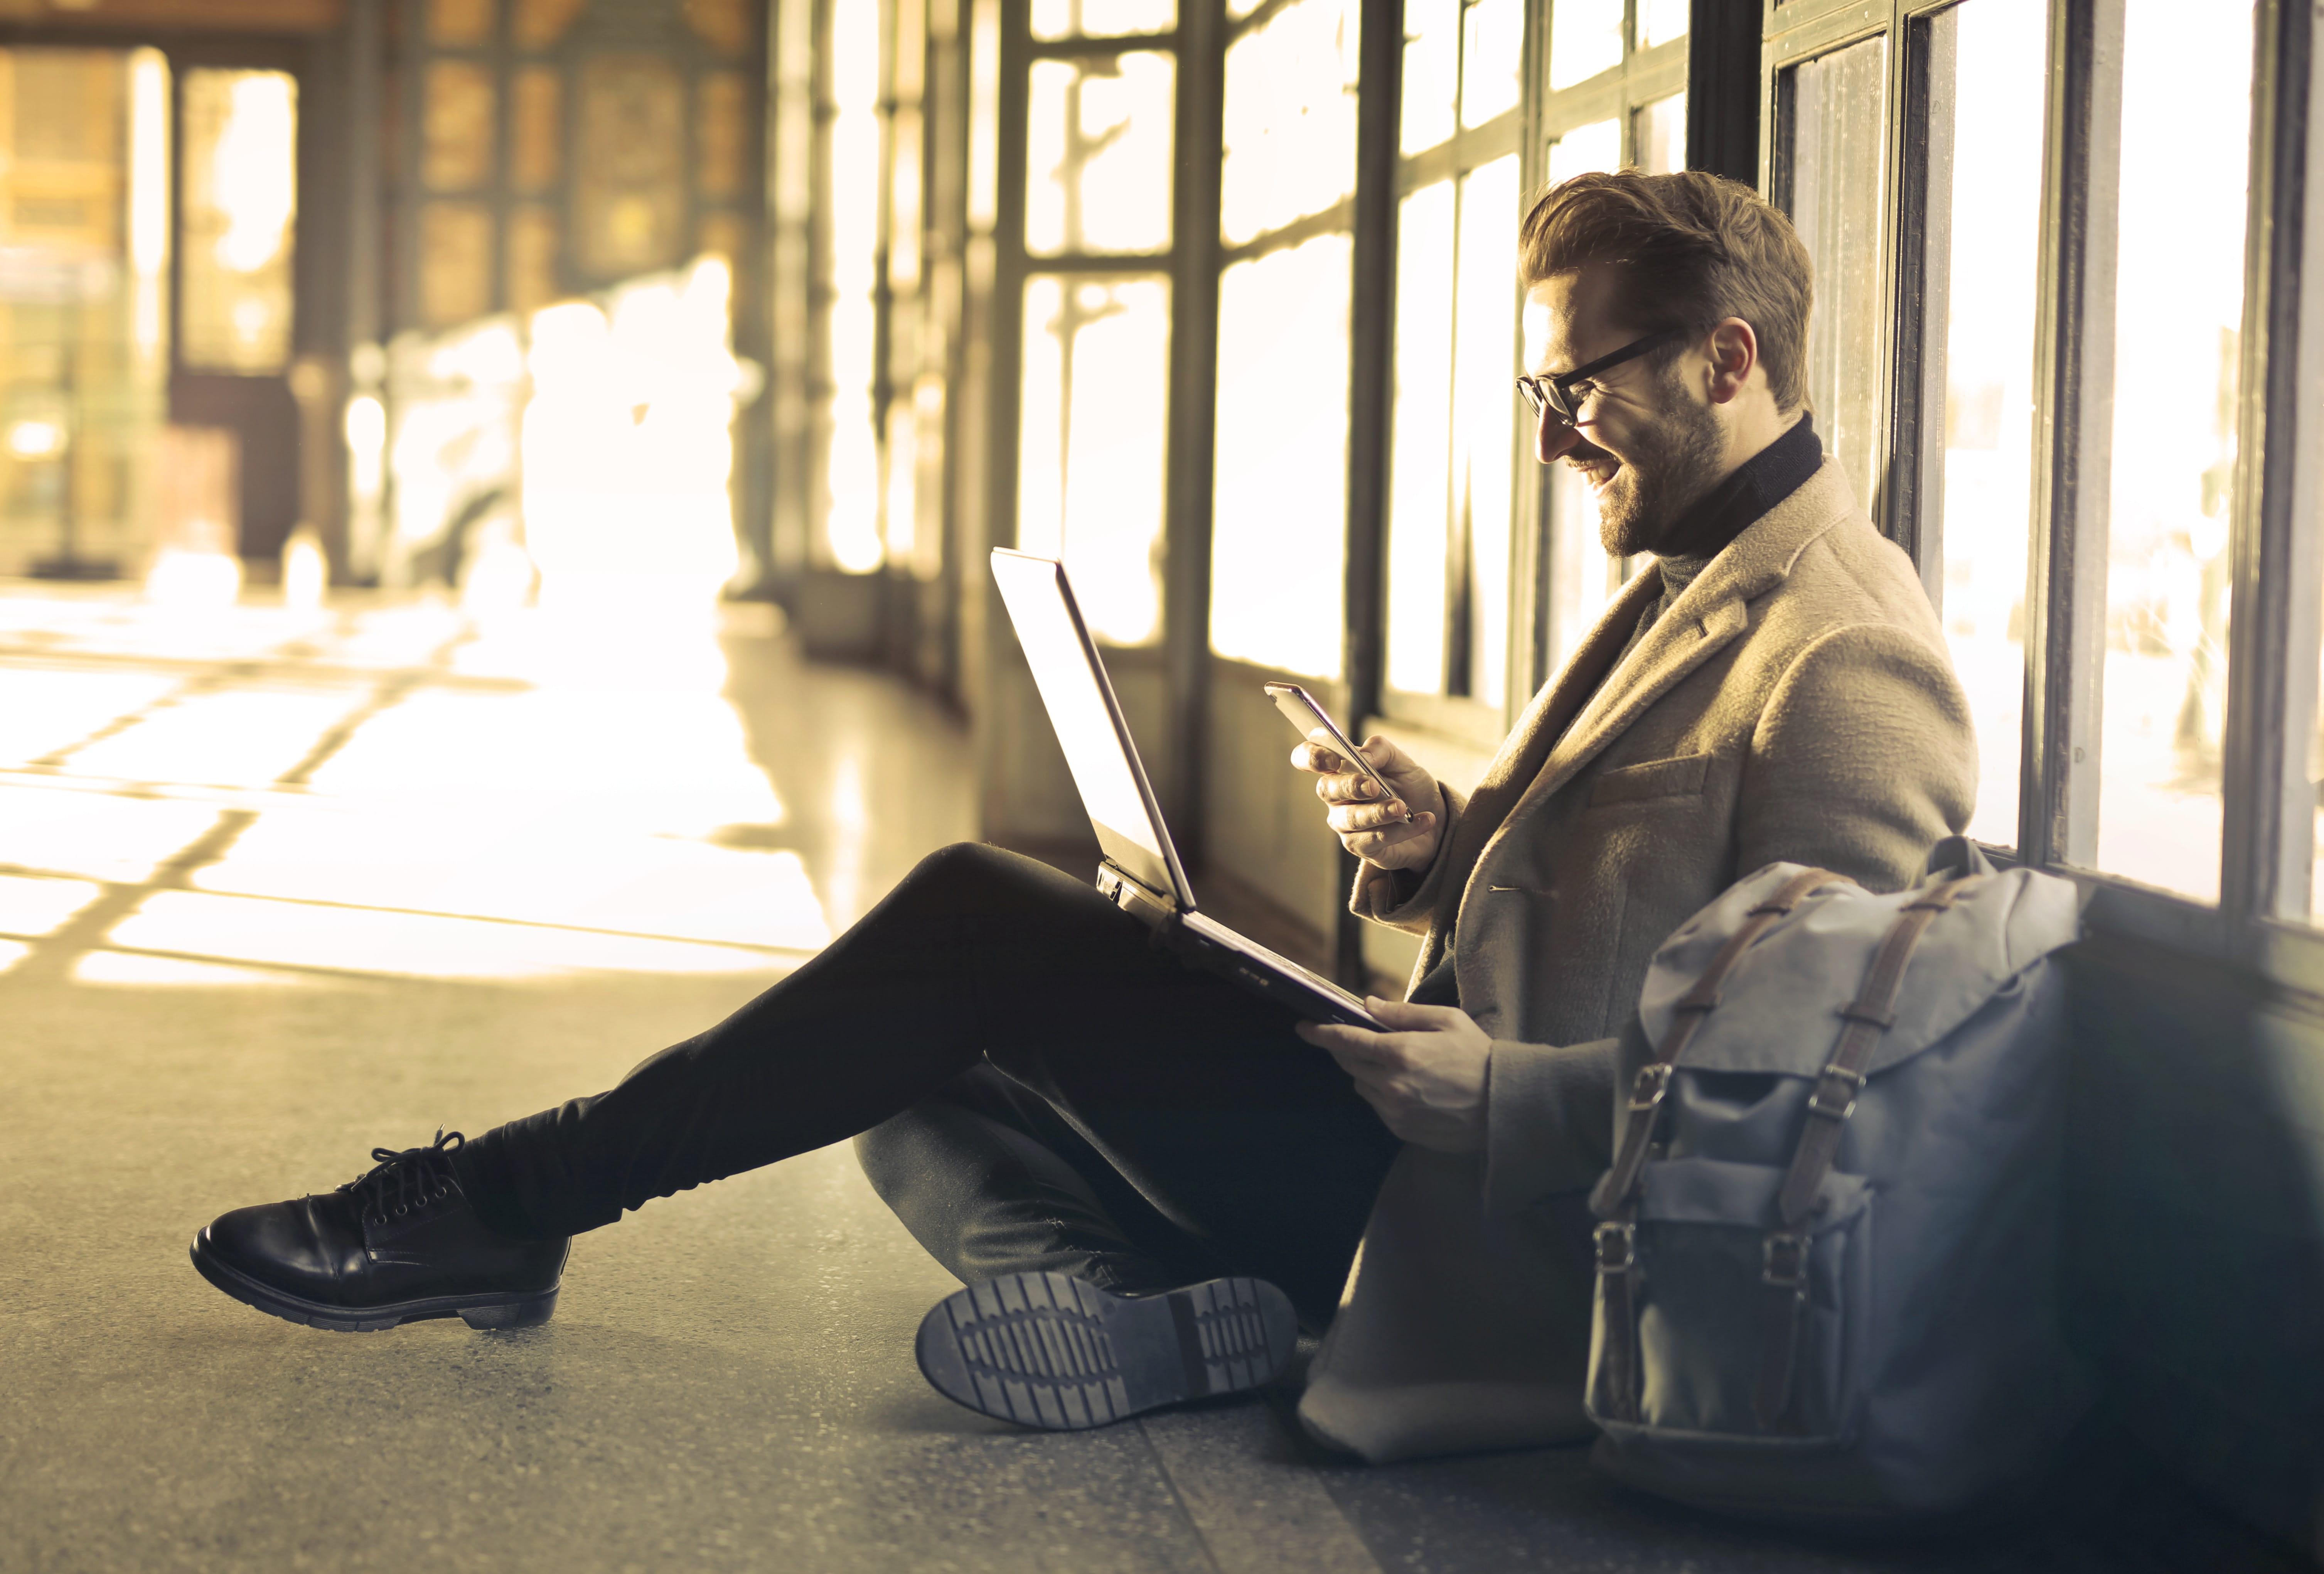 Man sitting near window holding phone and laptop; image by Bruce Mars, via Unsplash.com.